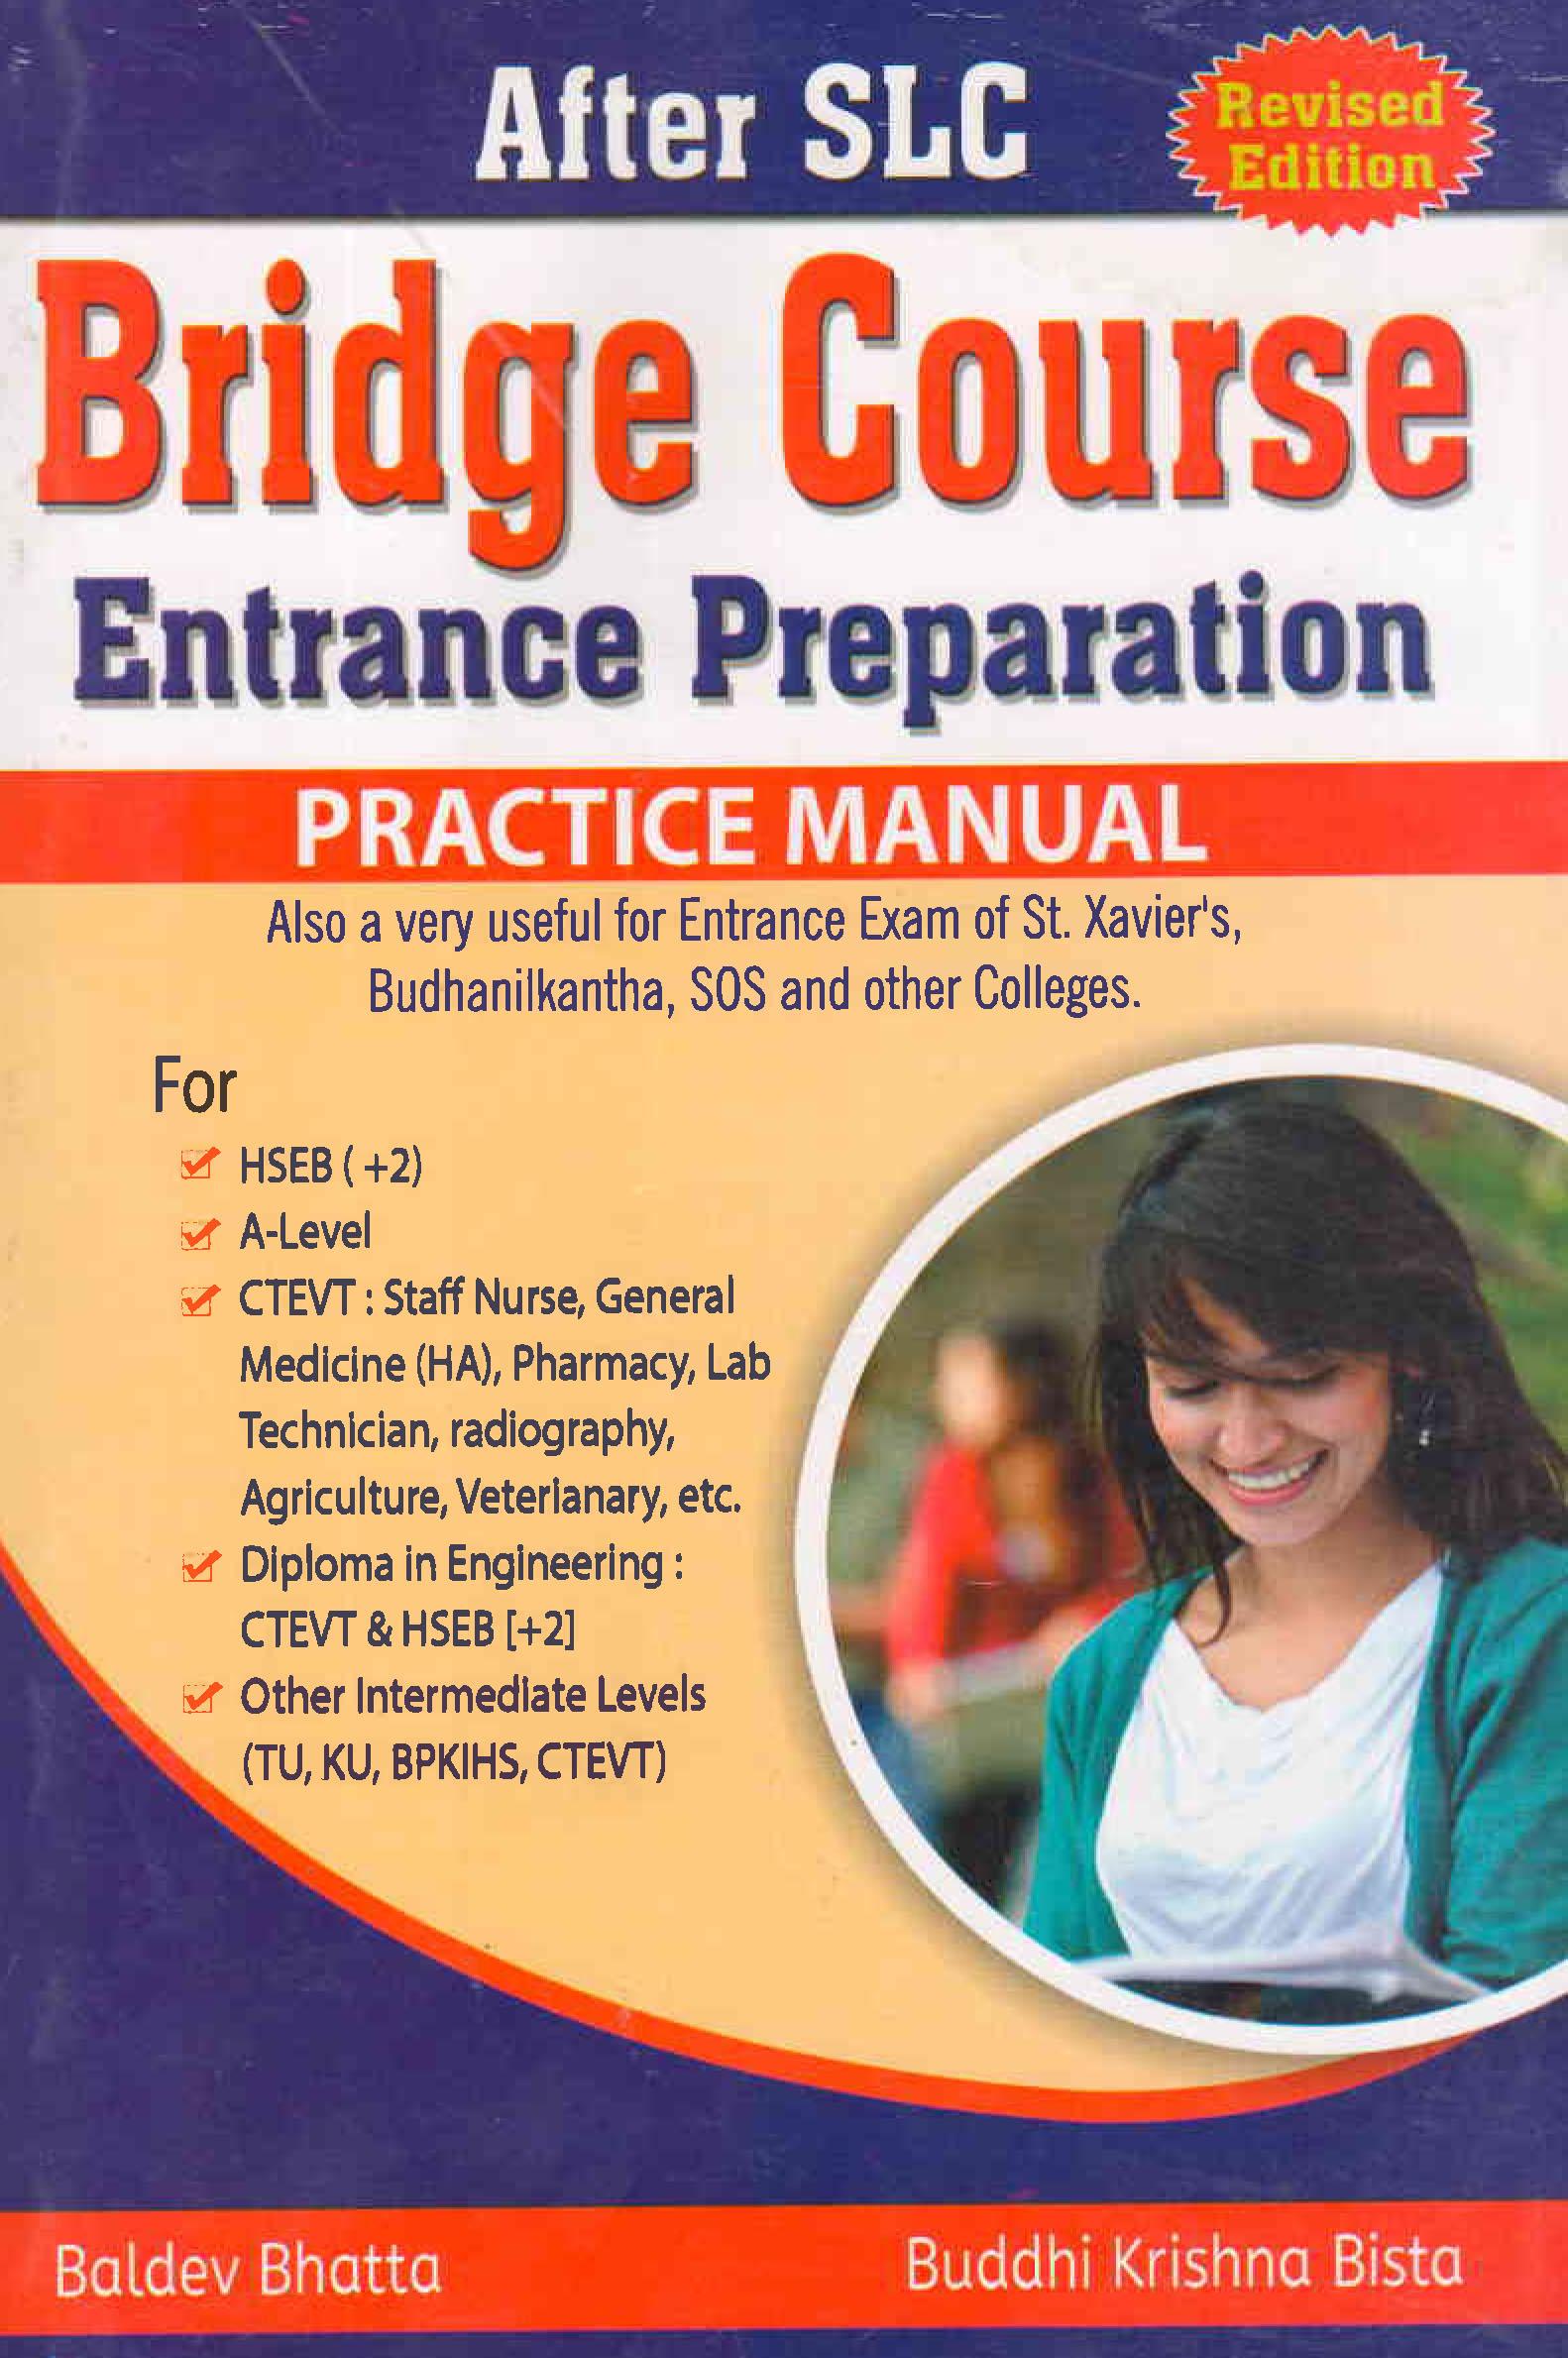 After SLC Bridge Course Entrance Preparation - Heritage Publishers